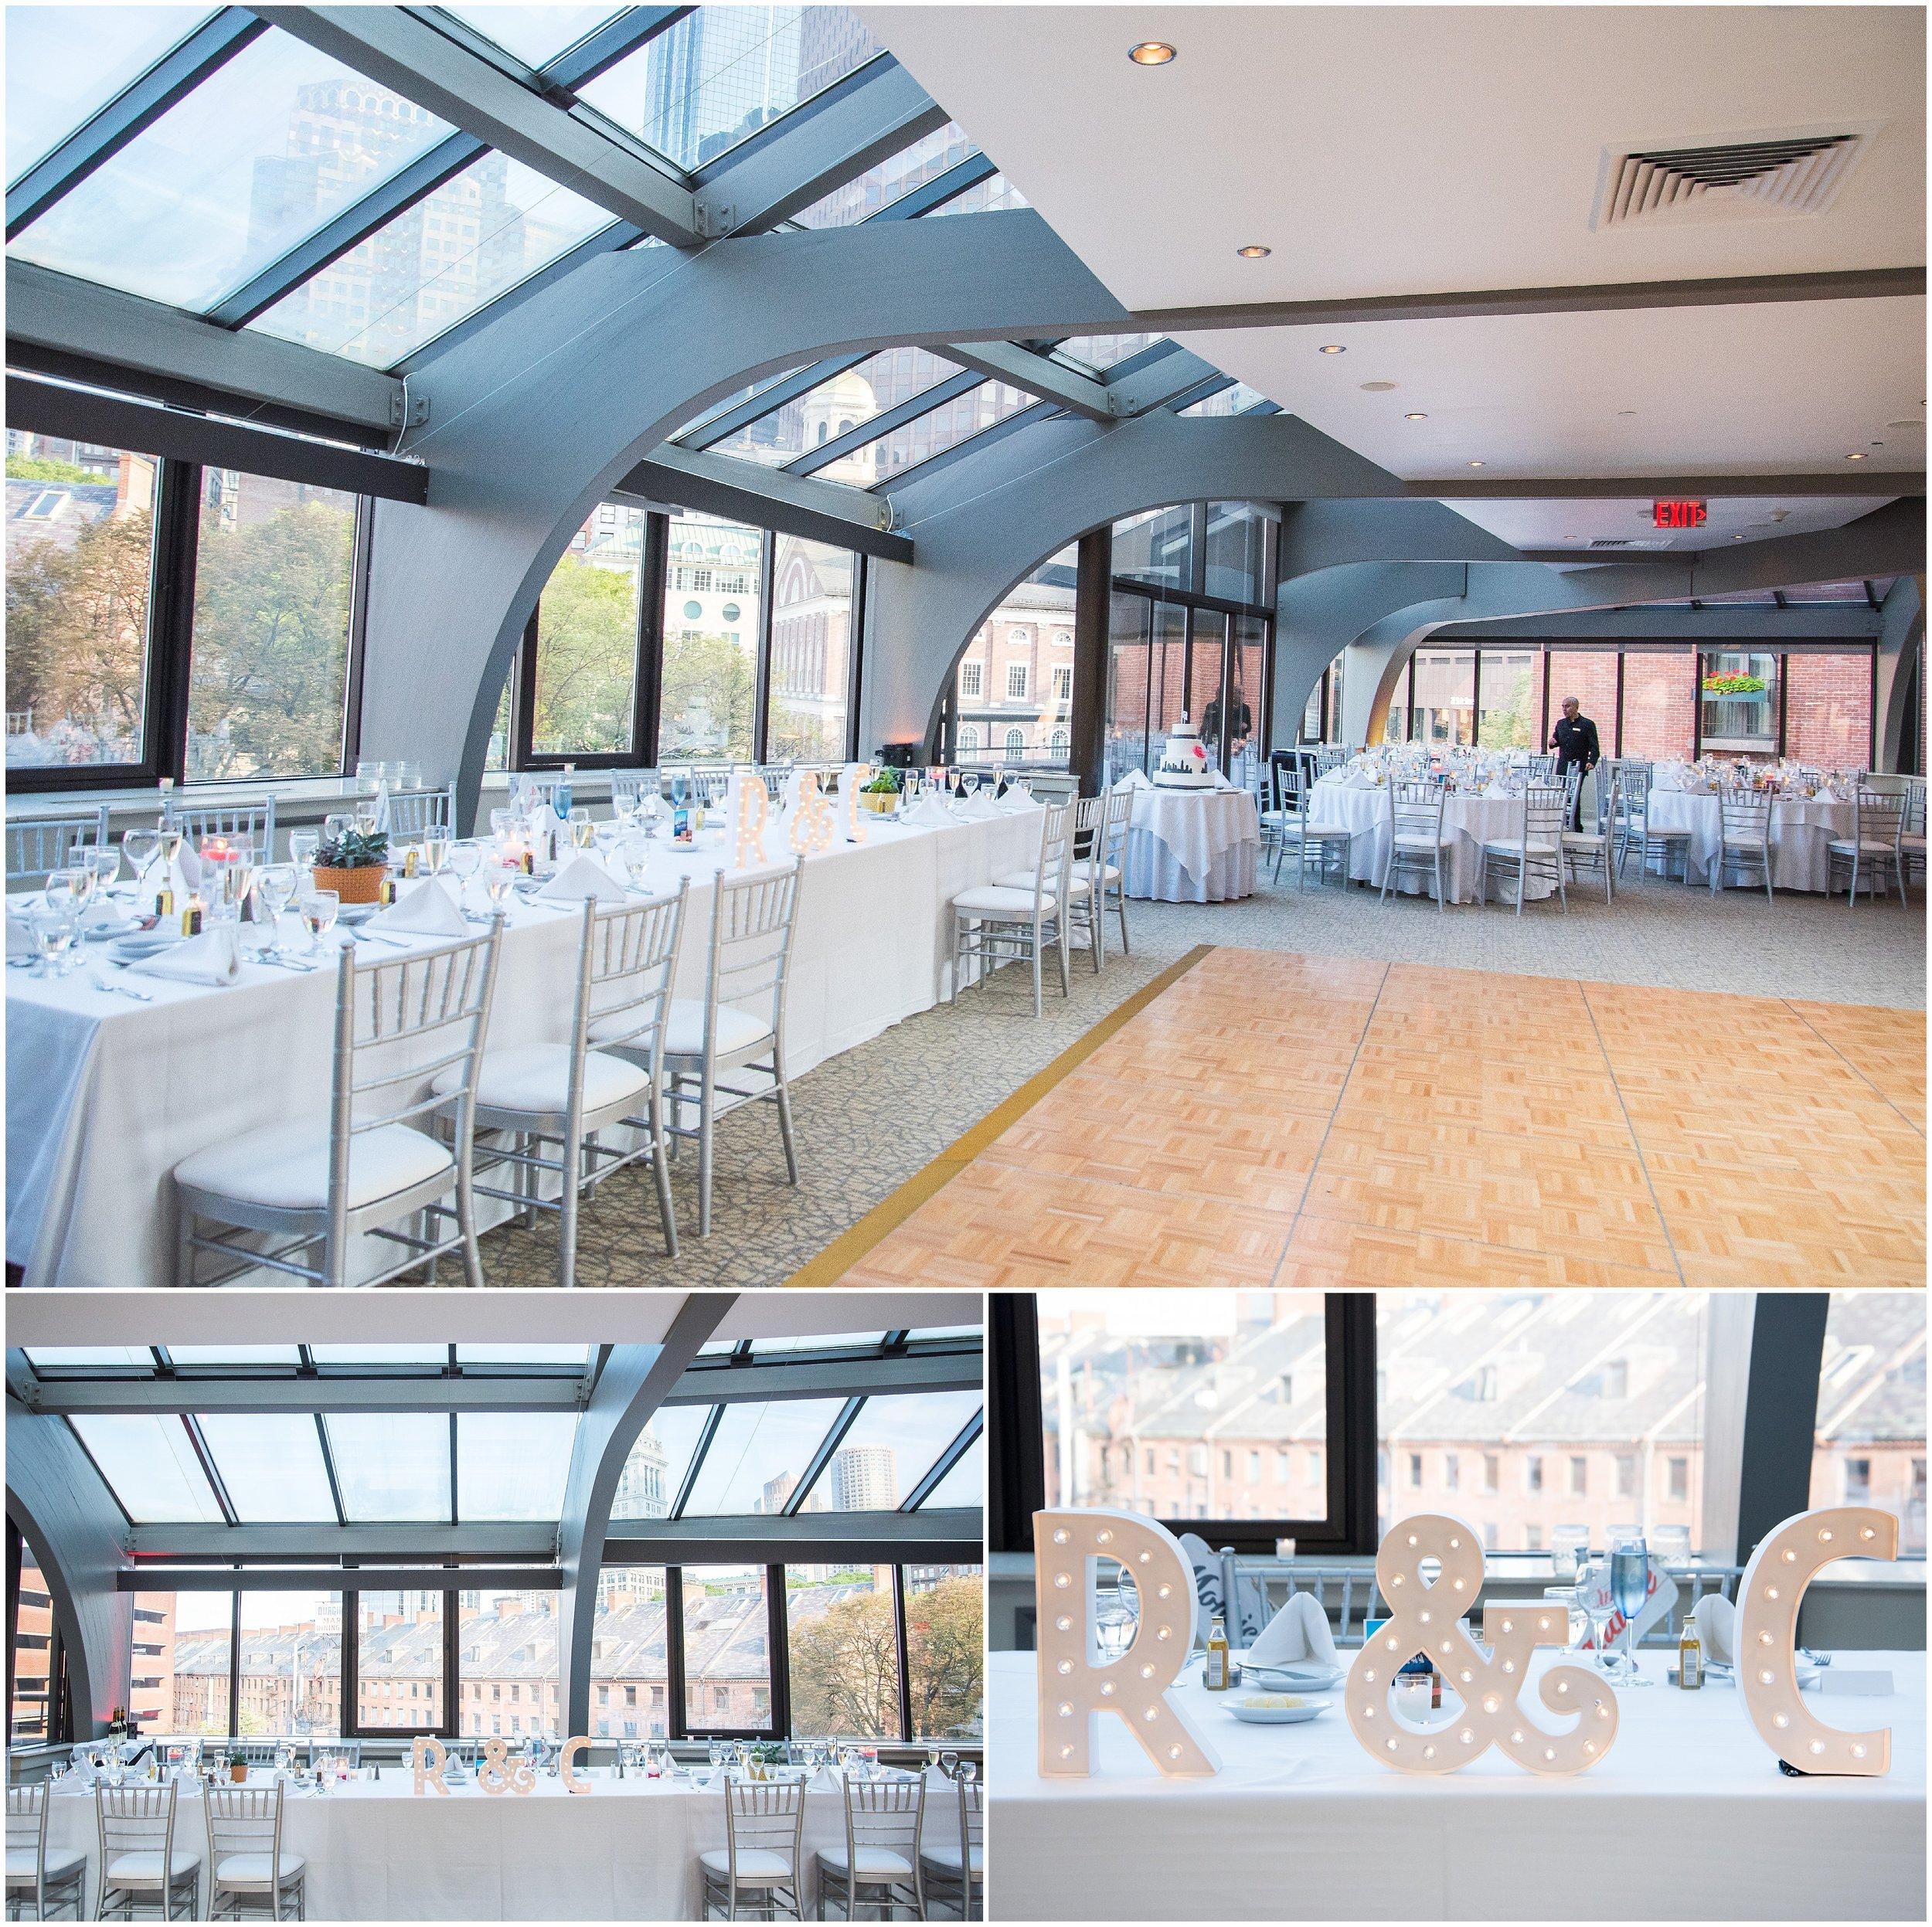 Boston Wedding Photographer, Iryna's Photography.Konditor Meister Wedding Cake. The Bostonian Boston Hotel Wedding Photos,Ceremony at St Cecilia Parish,Wedding Photos, Boston Weddings. Charles River Wedding Photos, Esplanade Wedding Photos.